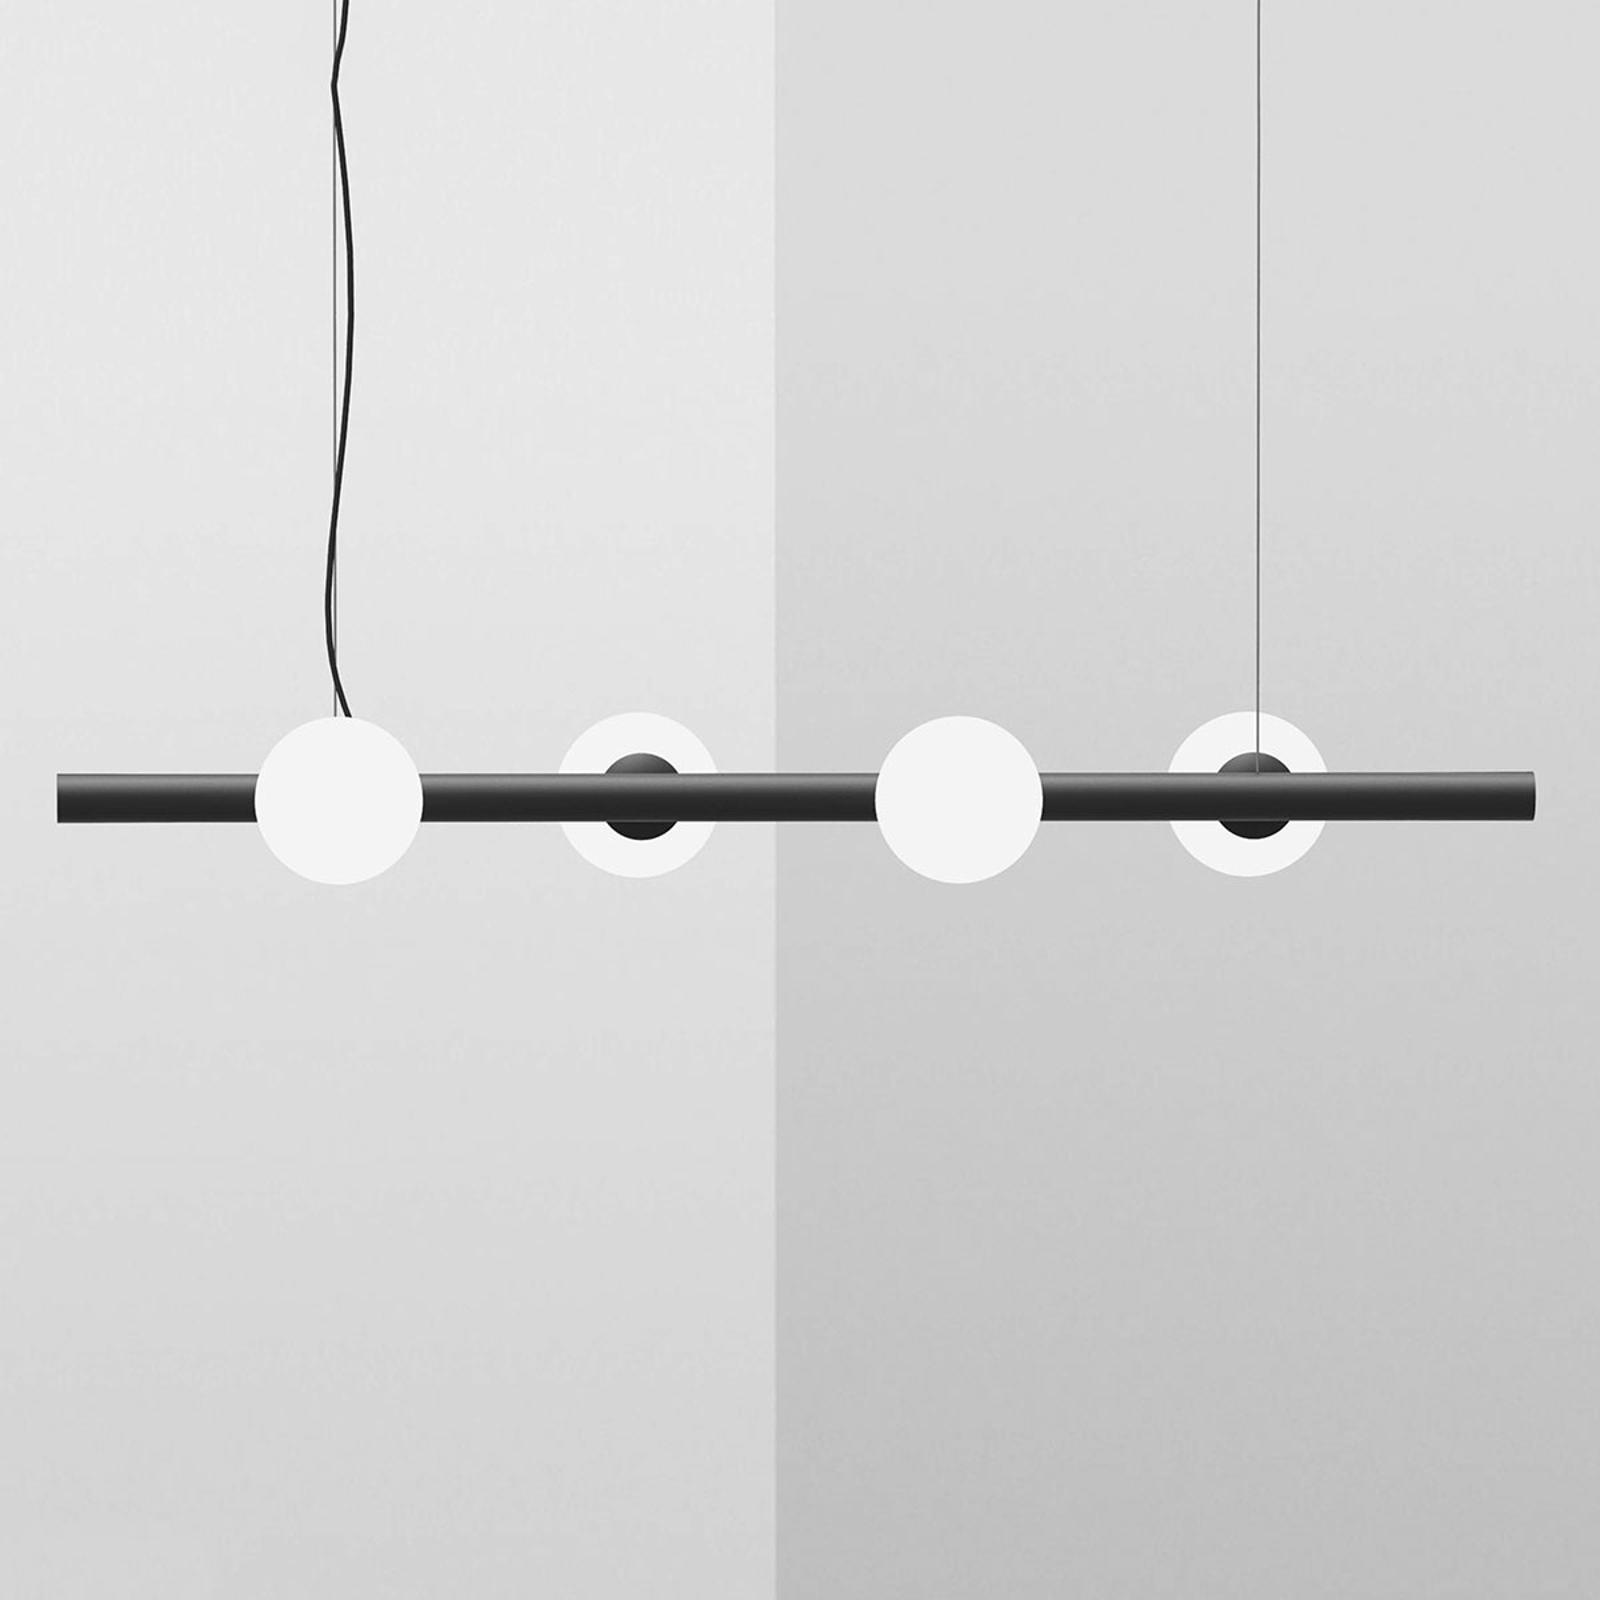 Lampada sospensione Tin Tin 4 luci nero